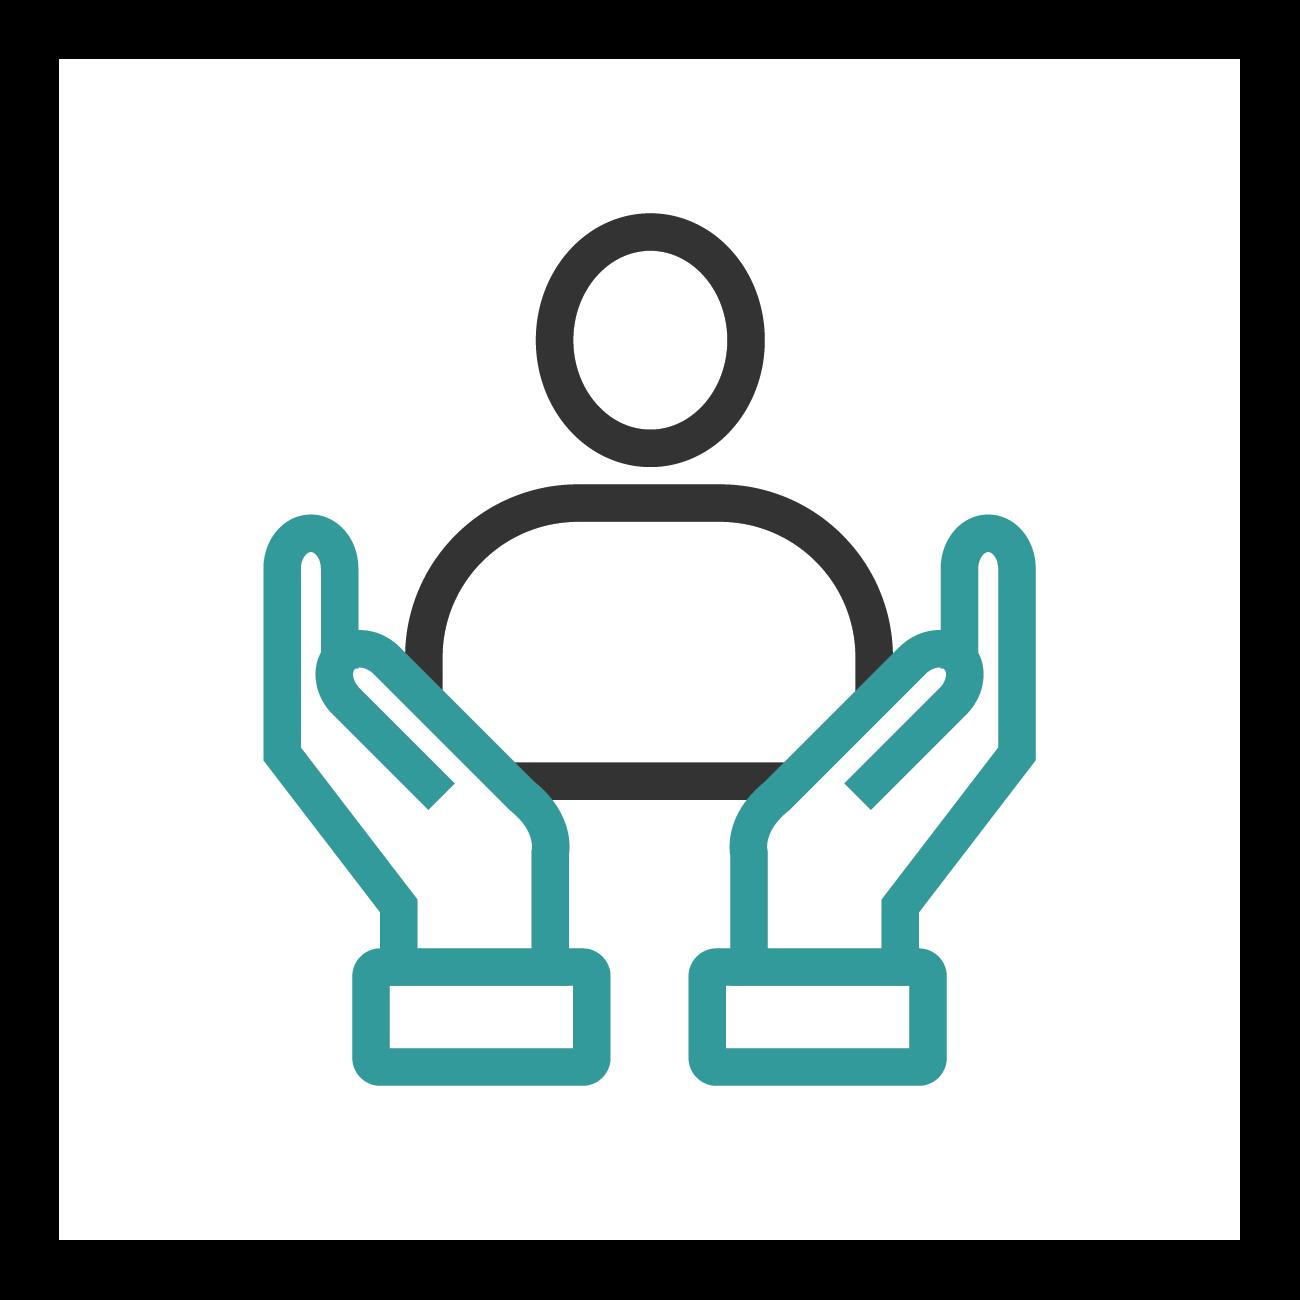 Social supporters logo